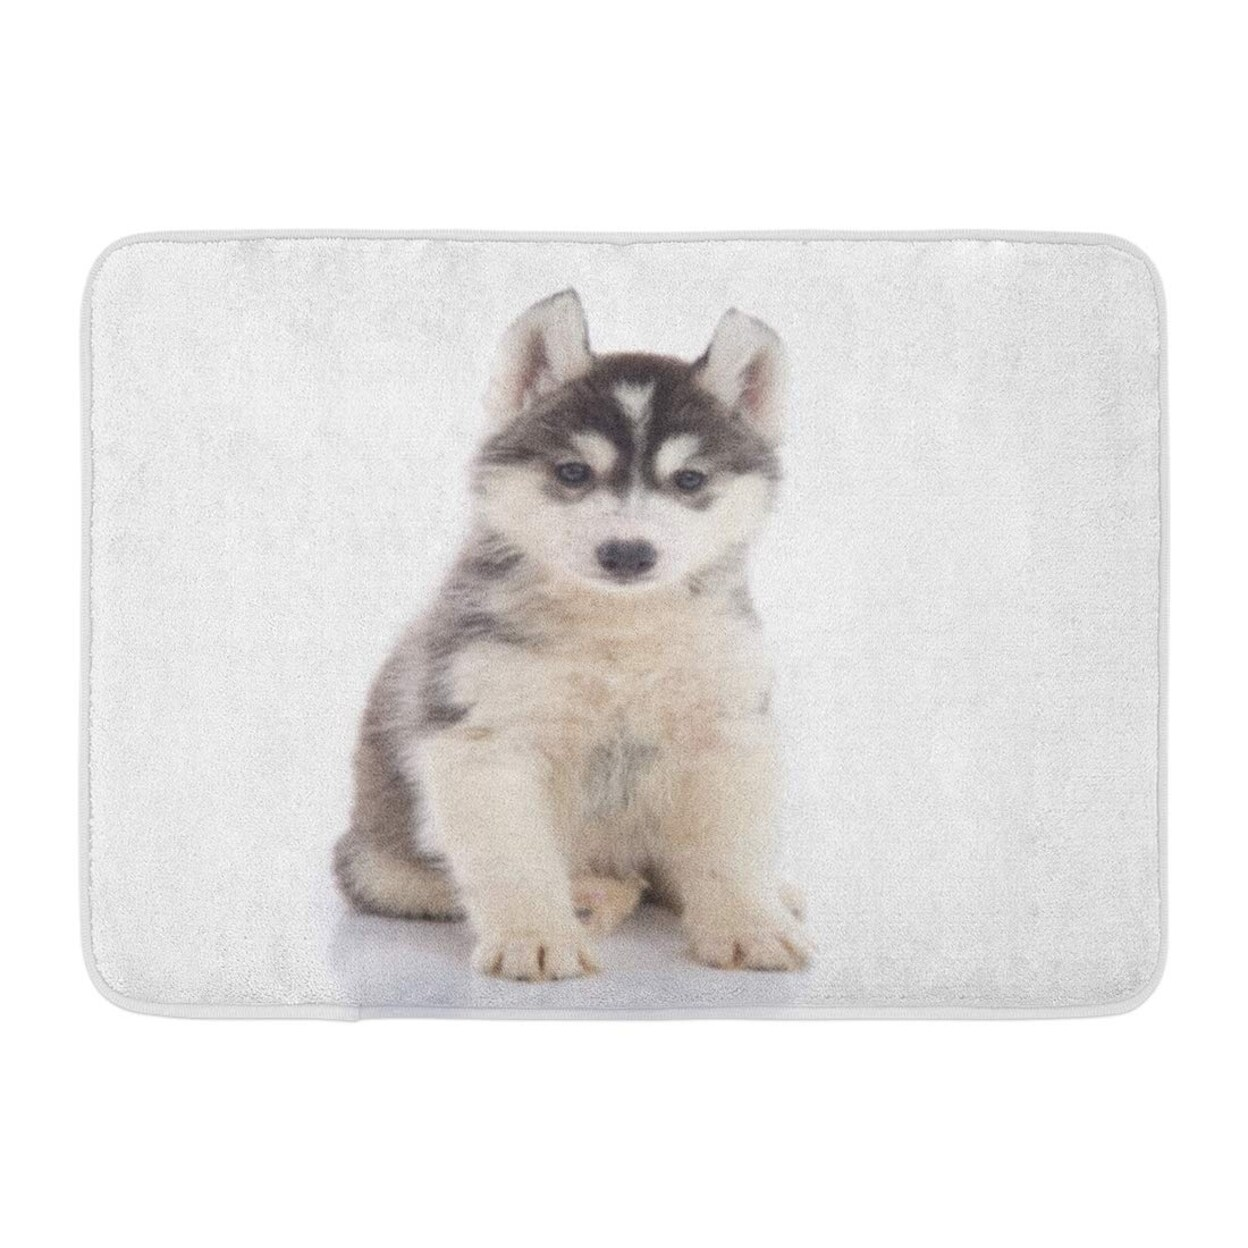 Brown Adorable Cute Siberian Husky Puppy Sitting On Baby Black Doormat Floor Rug Bath Mat 23 6x15 7 Inch Multi On Sale Overstock 31775669